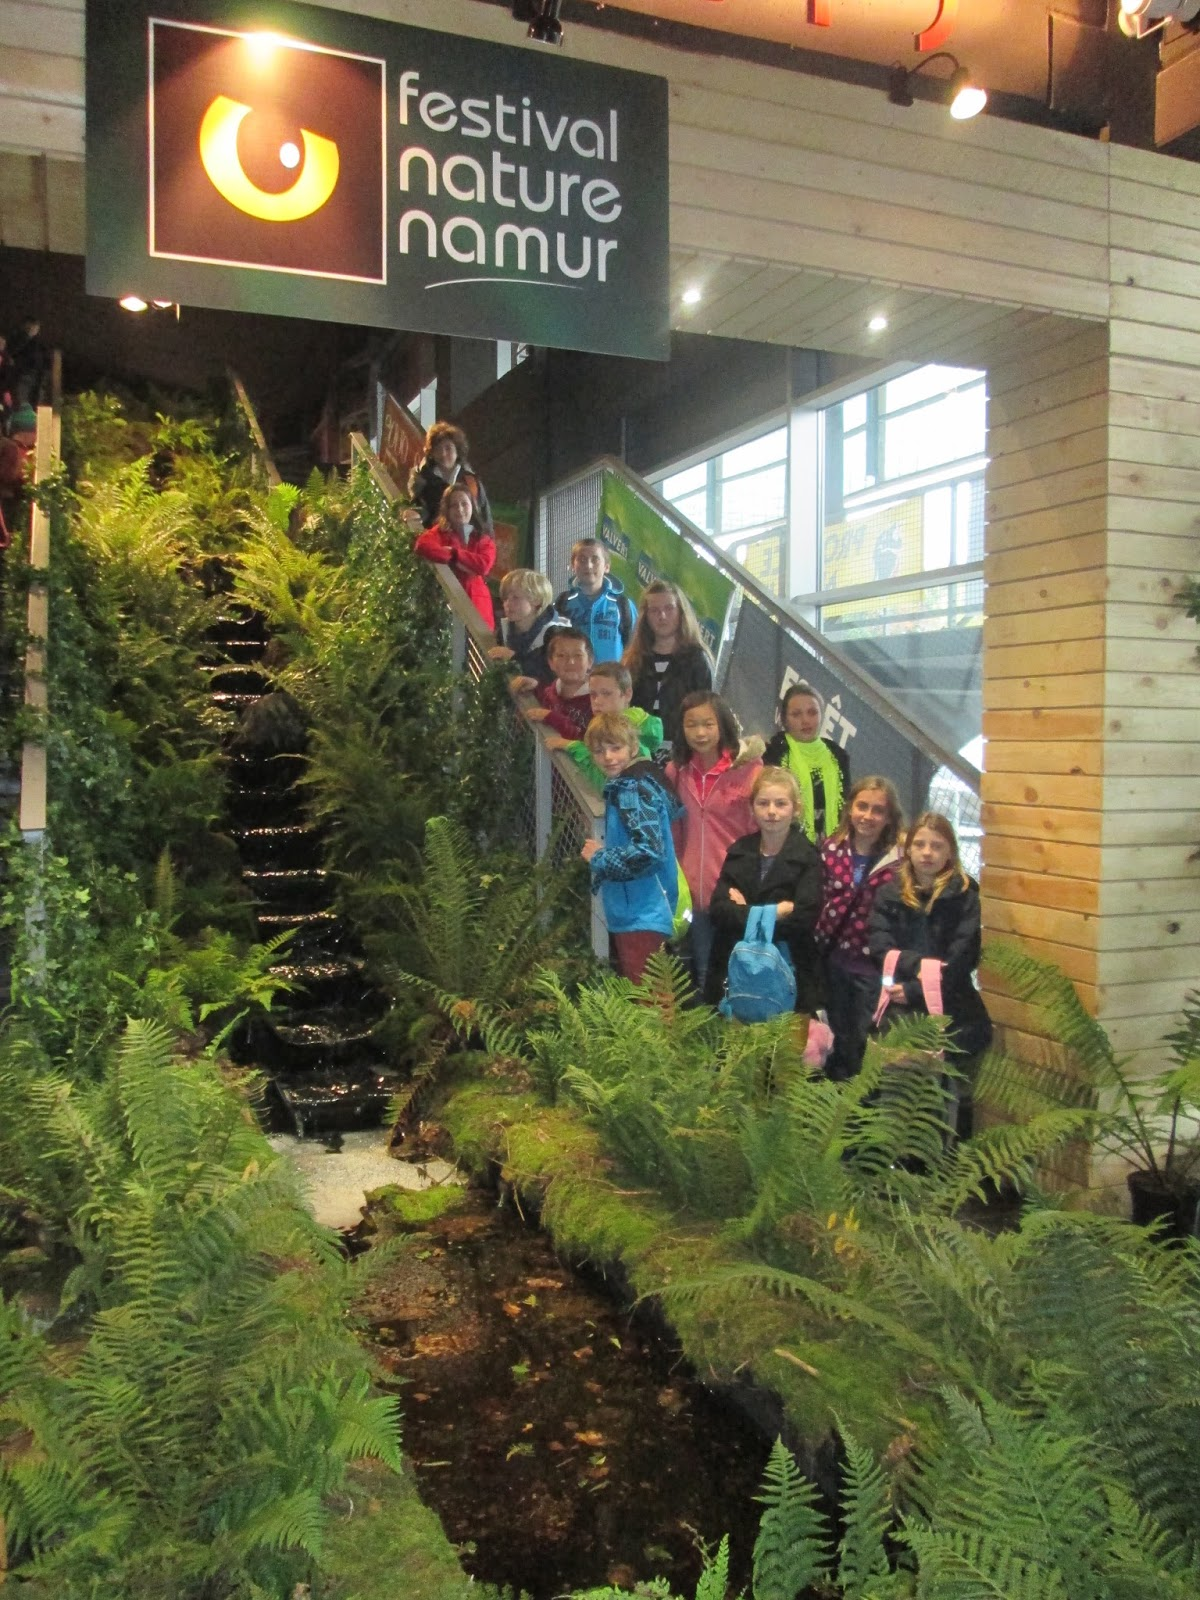 Blog de l 39 cole de wanlin un jardin extraordinaire for Jardin extraordinaire nancy 2015